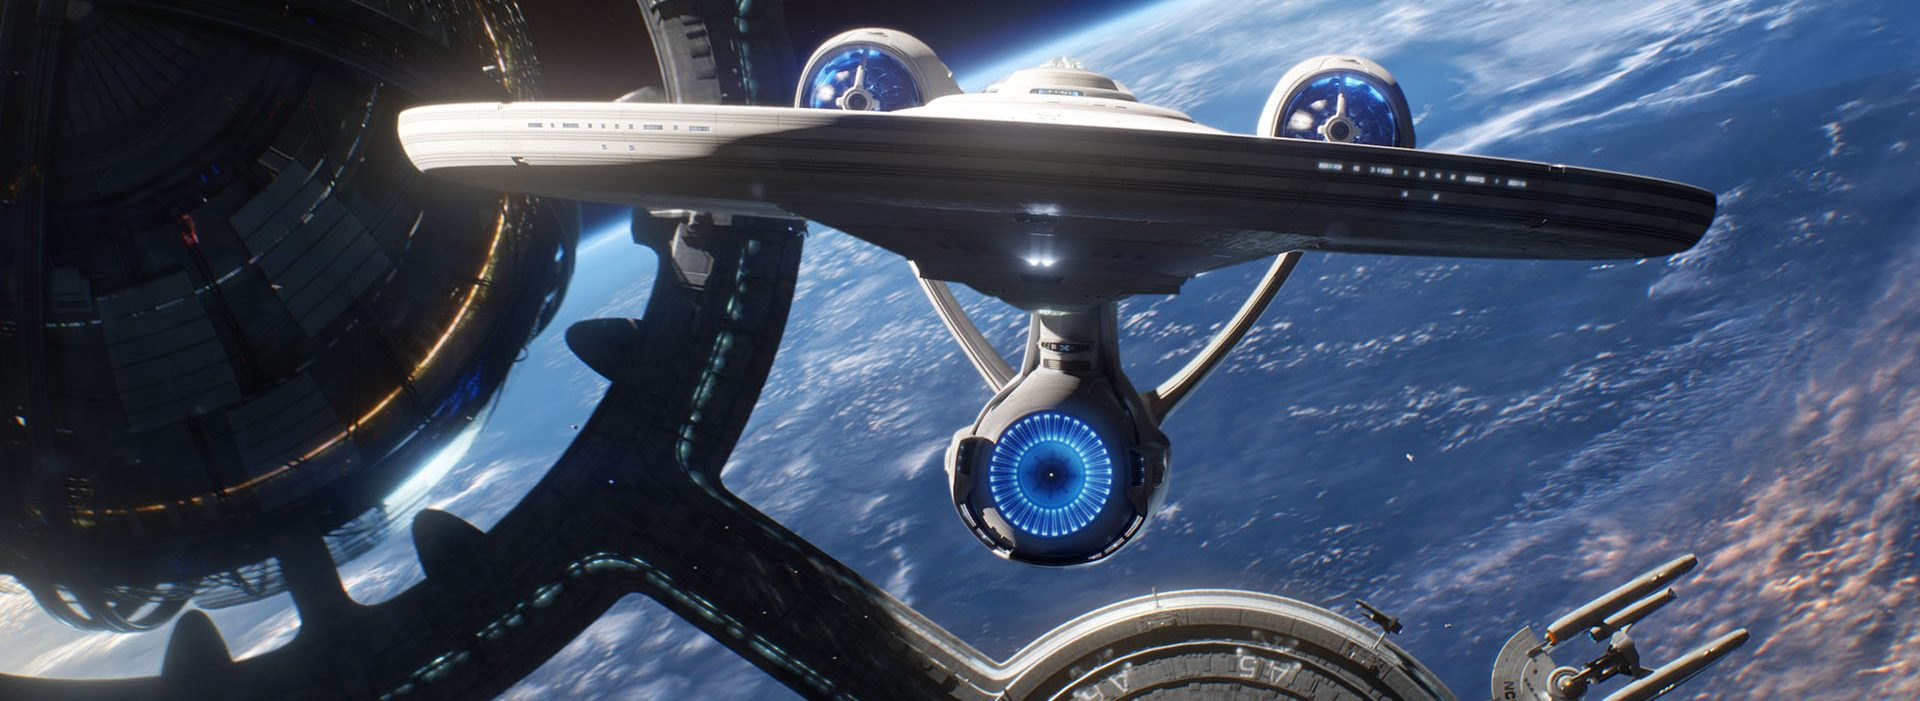 ILM Celebrates Star Trek Day   Industrial Light & Magic